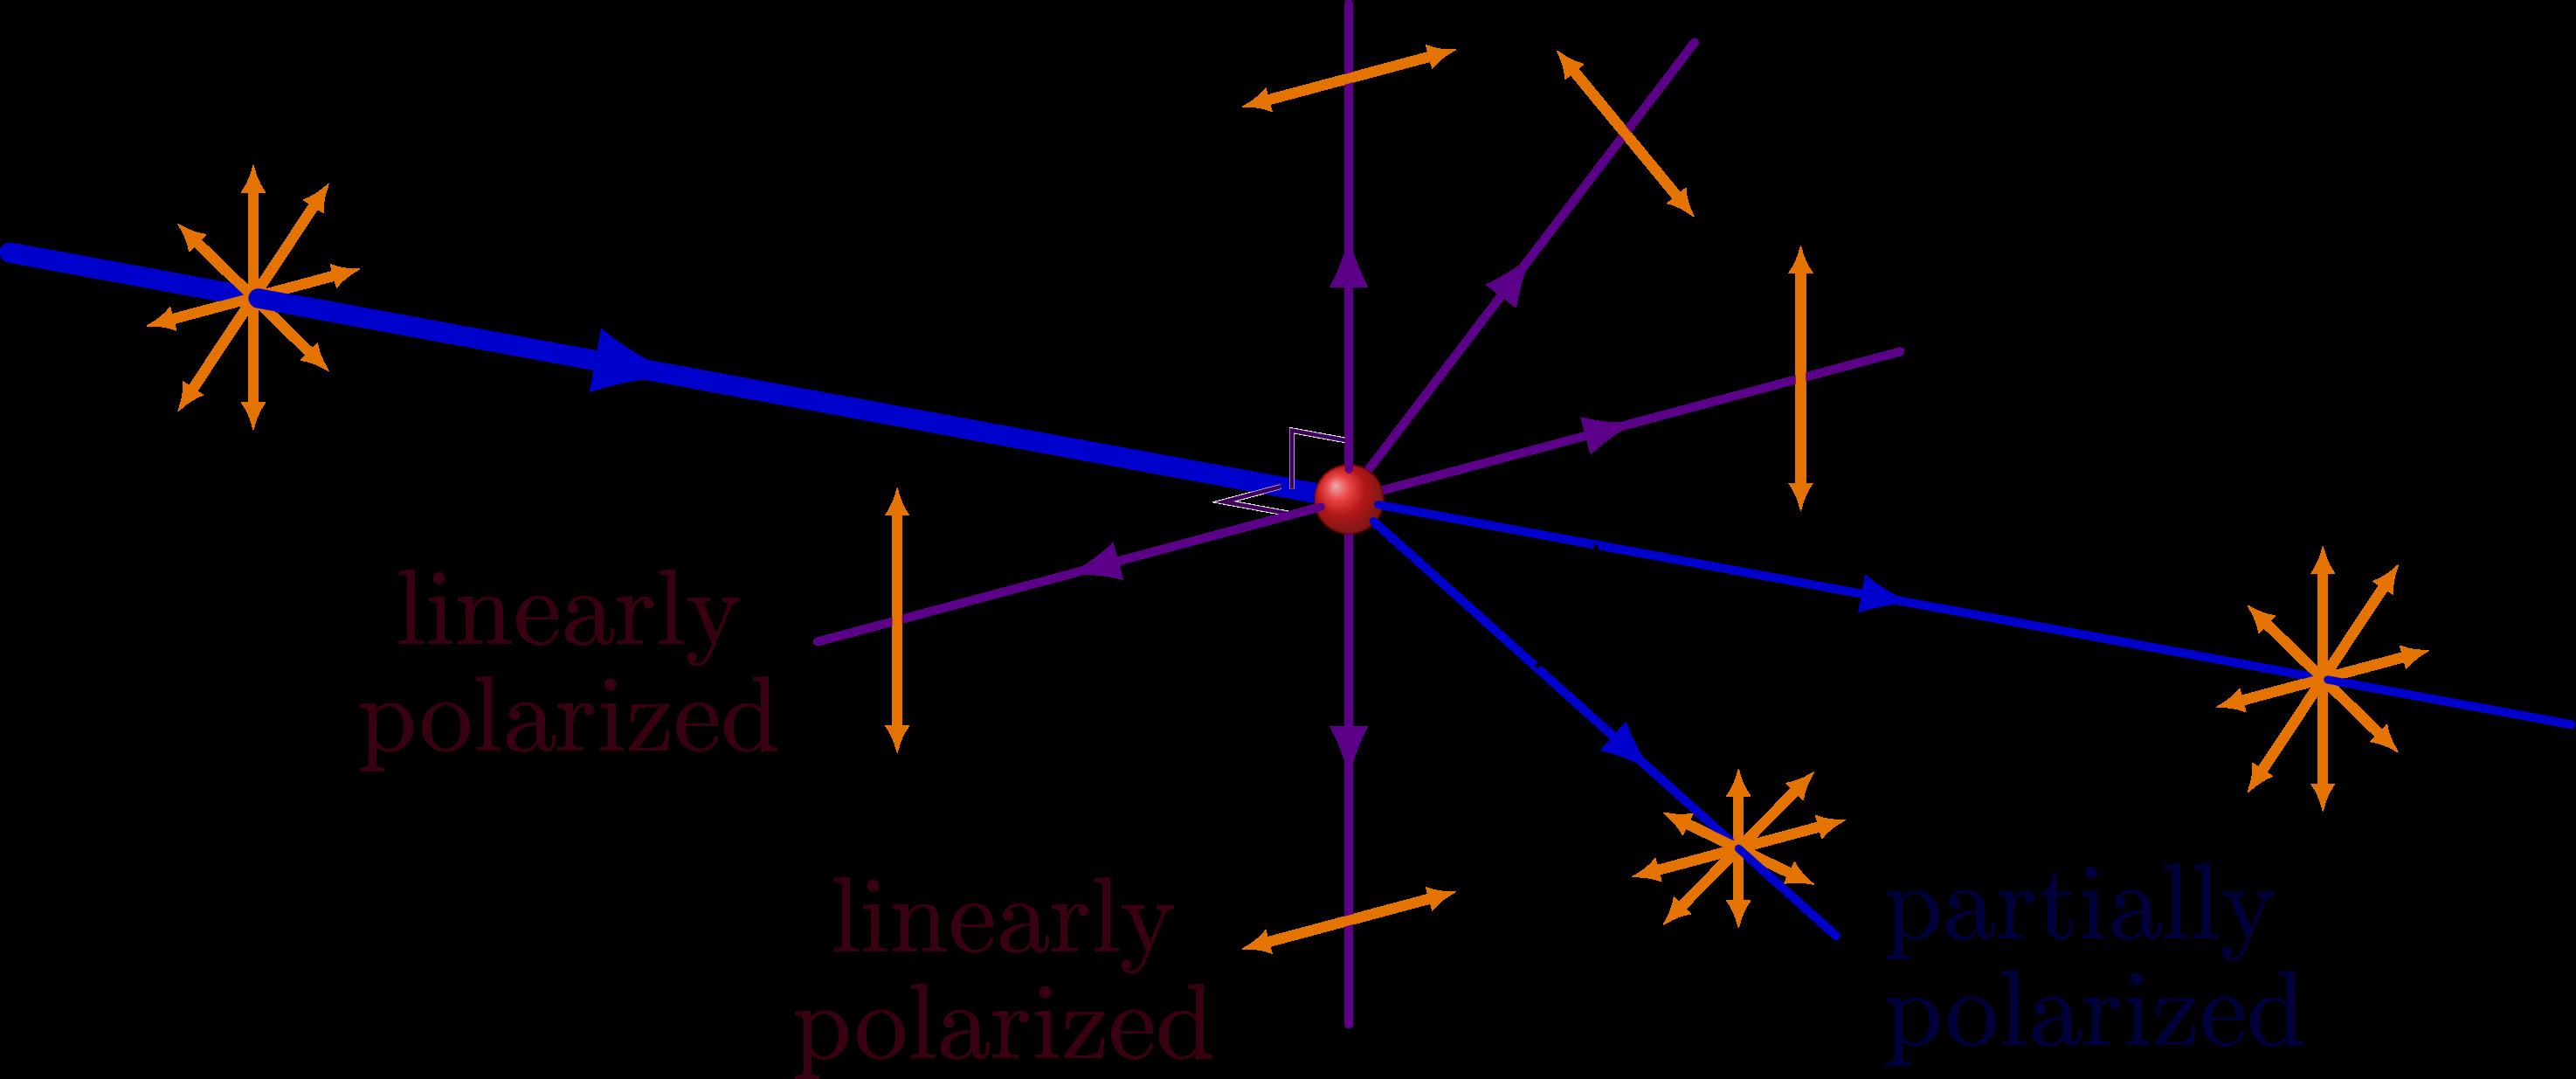 optics_scattering-001.png